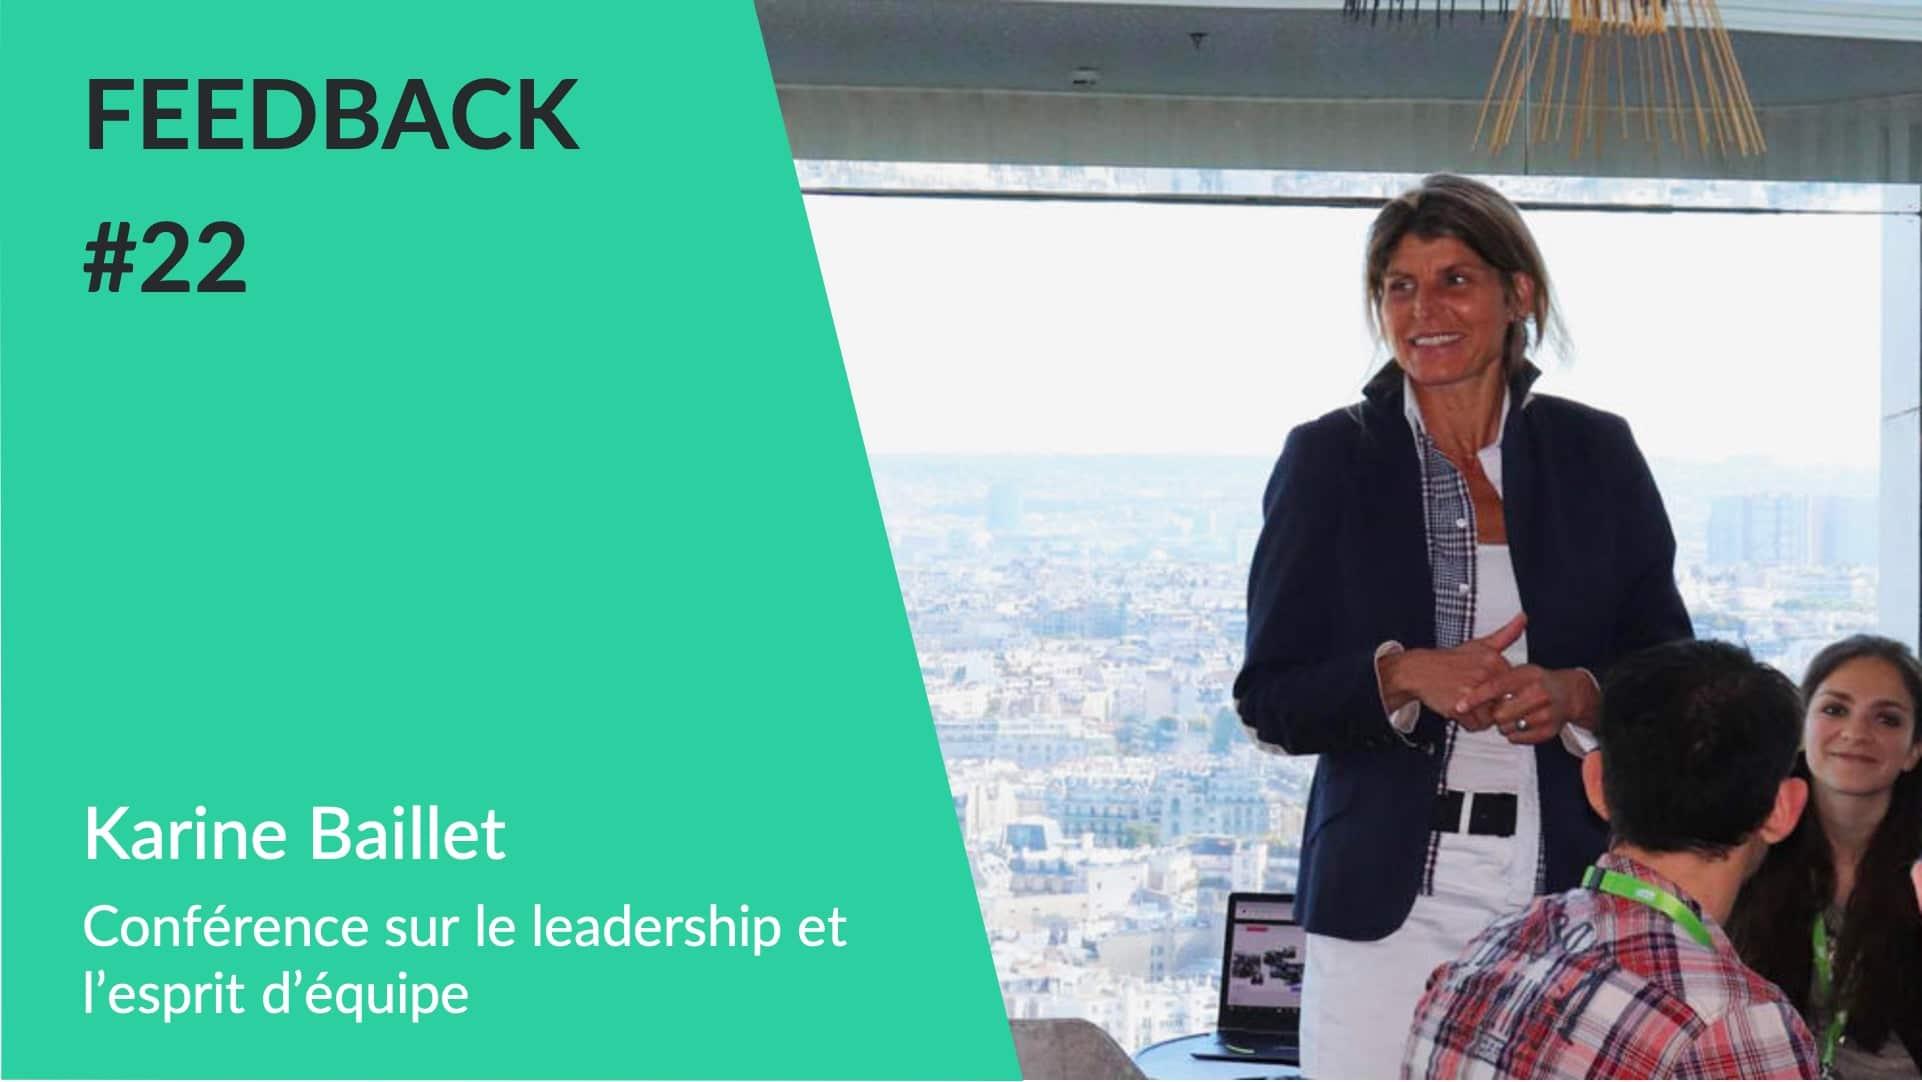 Feedback - Conférence Karine Baillet esprit d'équipe WeChamp